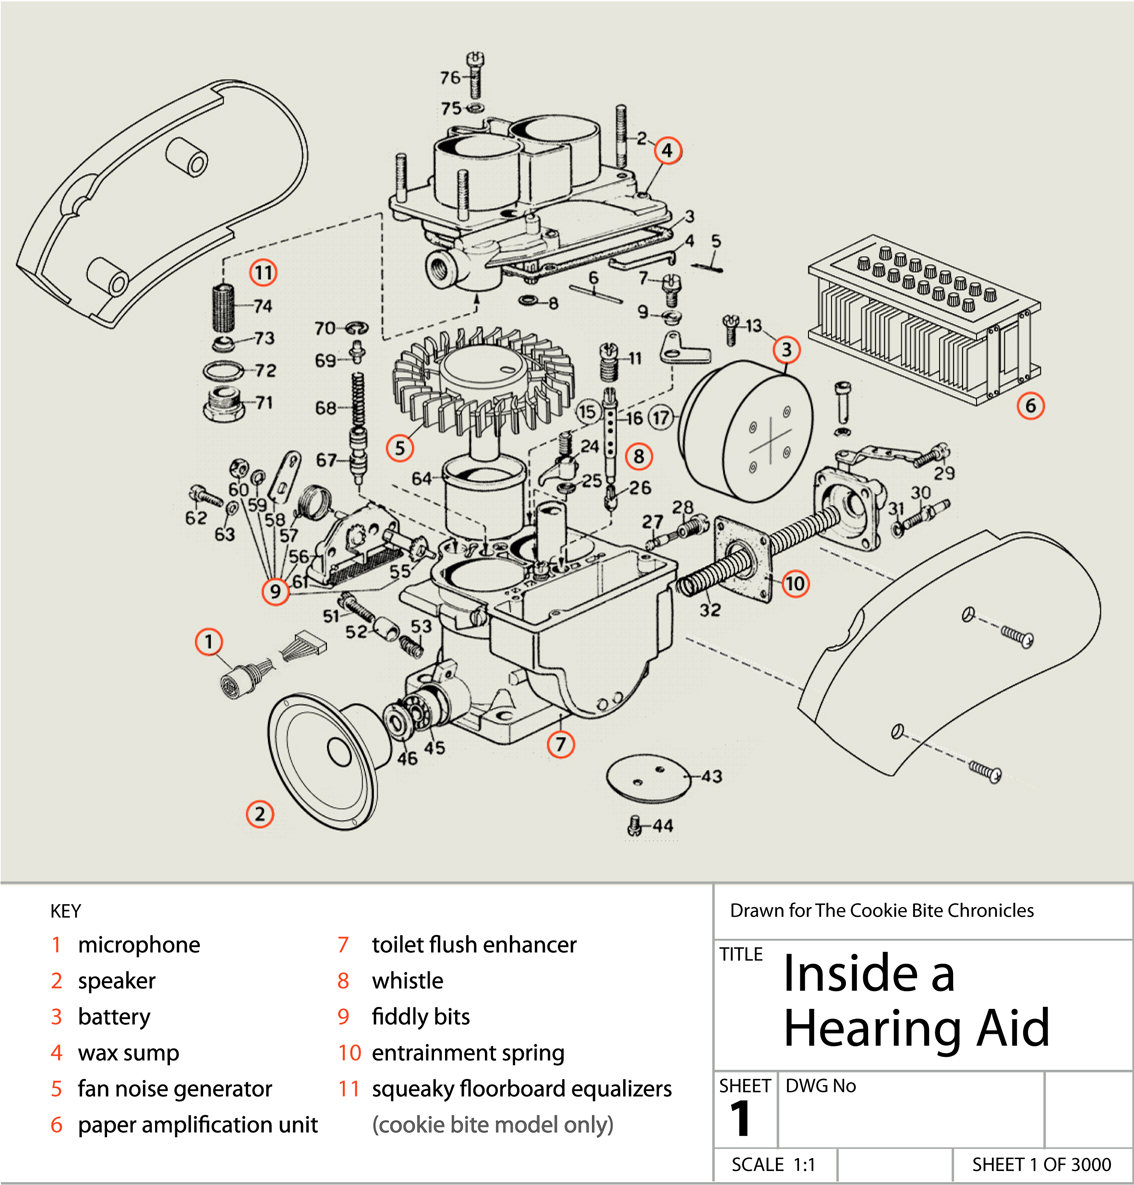 Hearing Aid Hacking